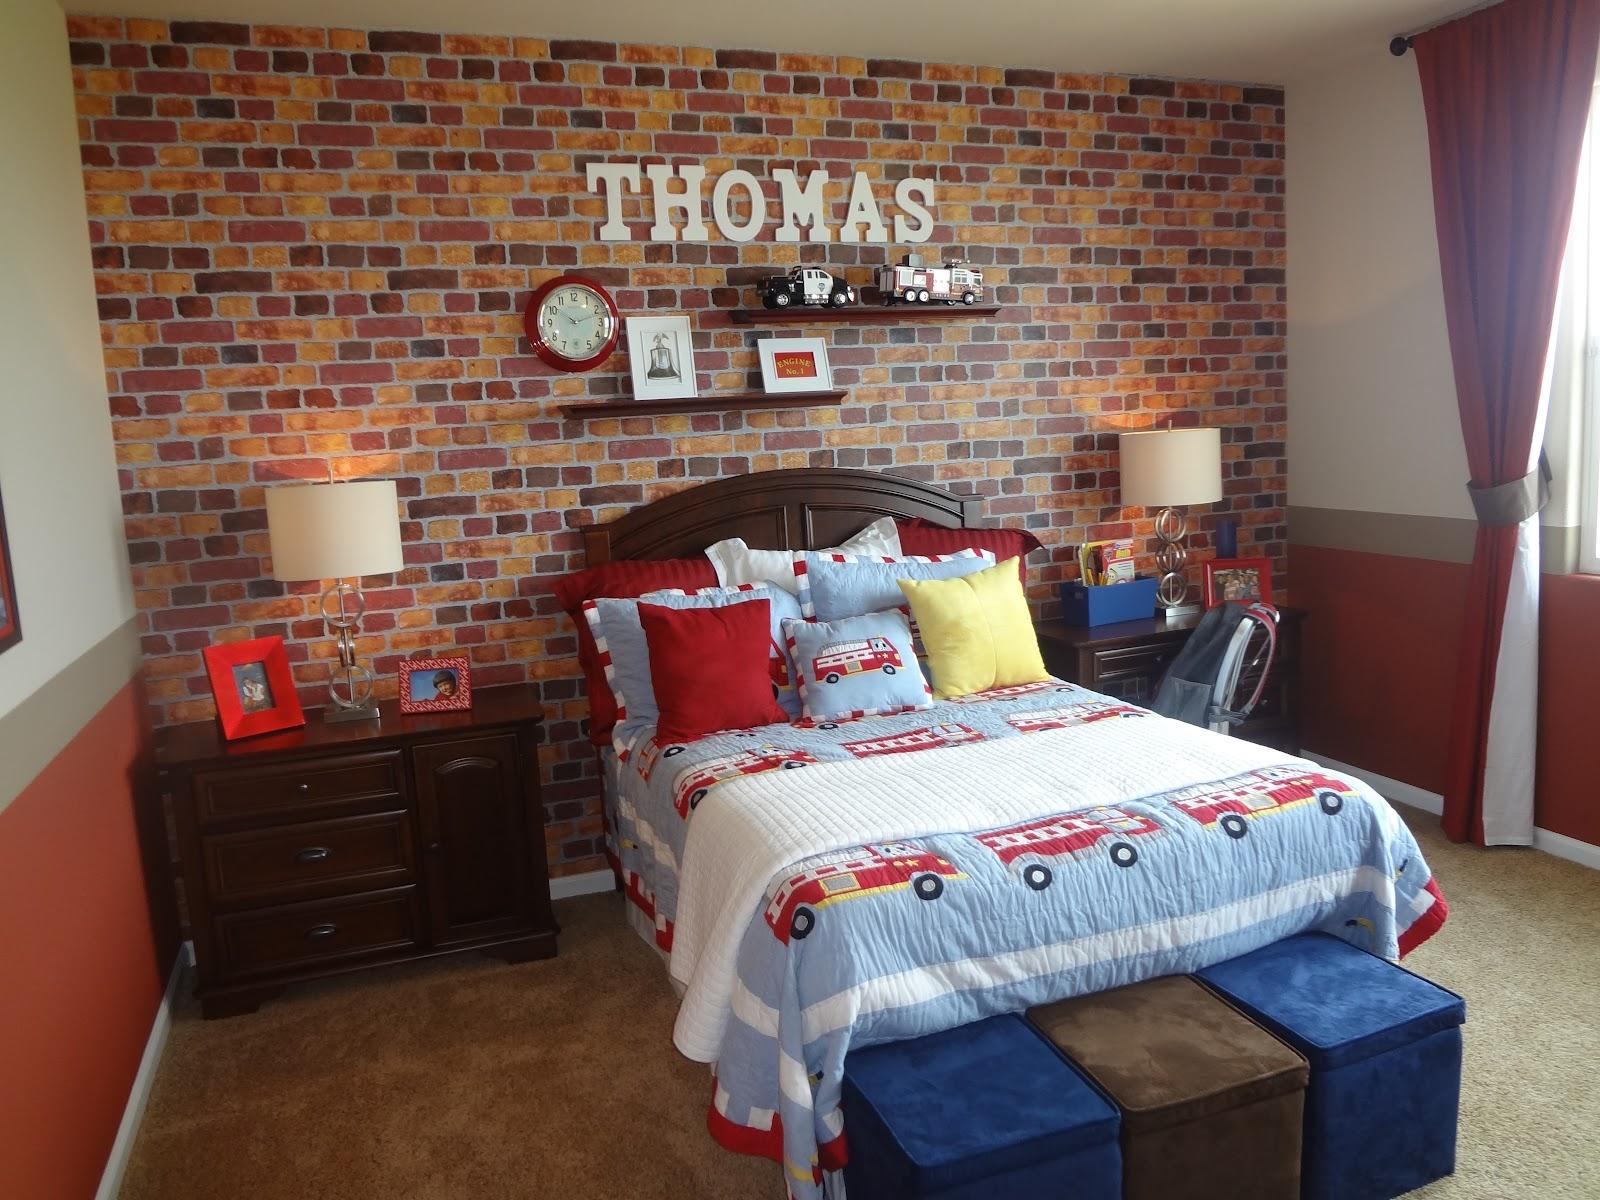 Brick Wallpaper Bedroom Ideas Home Design Ideas - Brick Wallpaper For Boys Room - HD Wallpaper